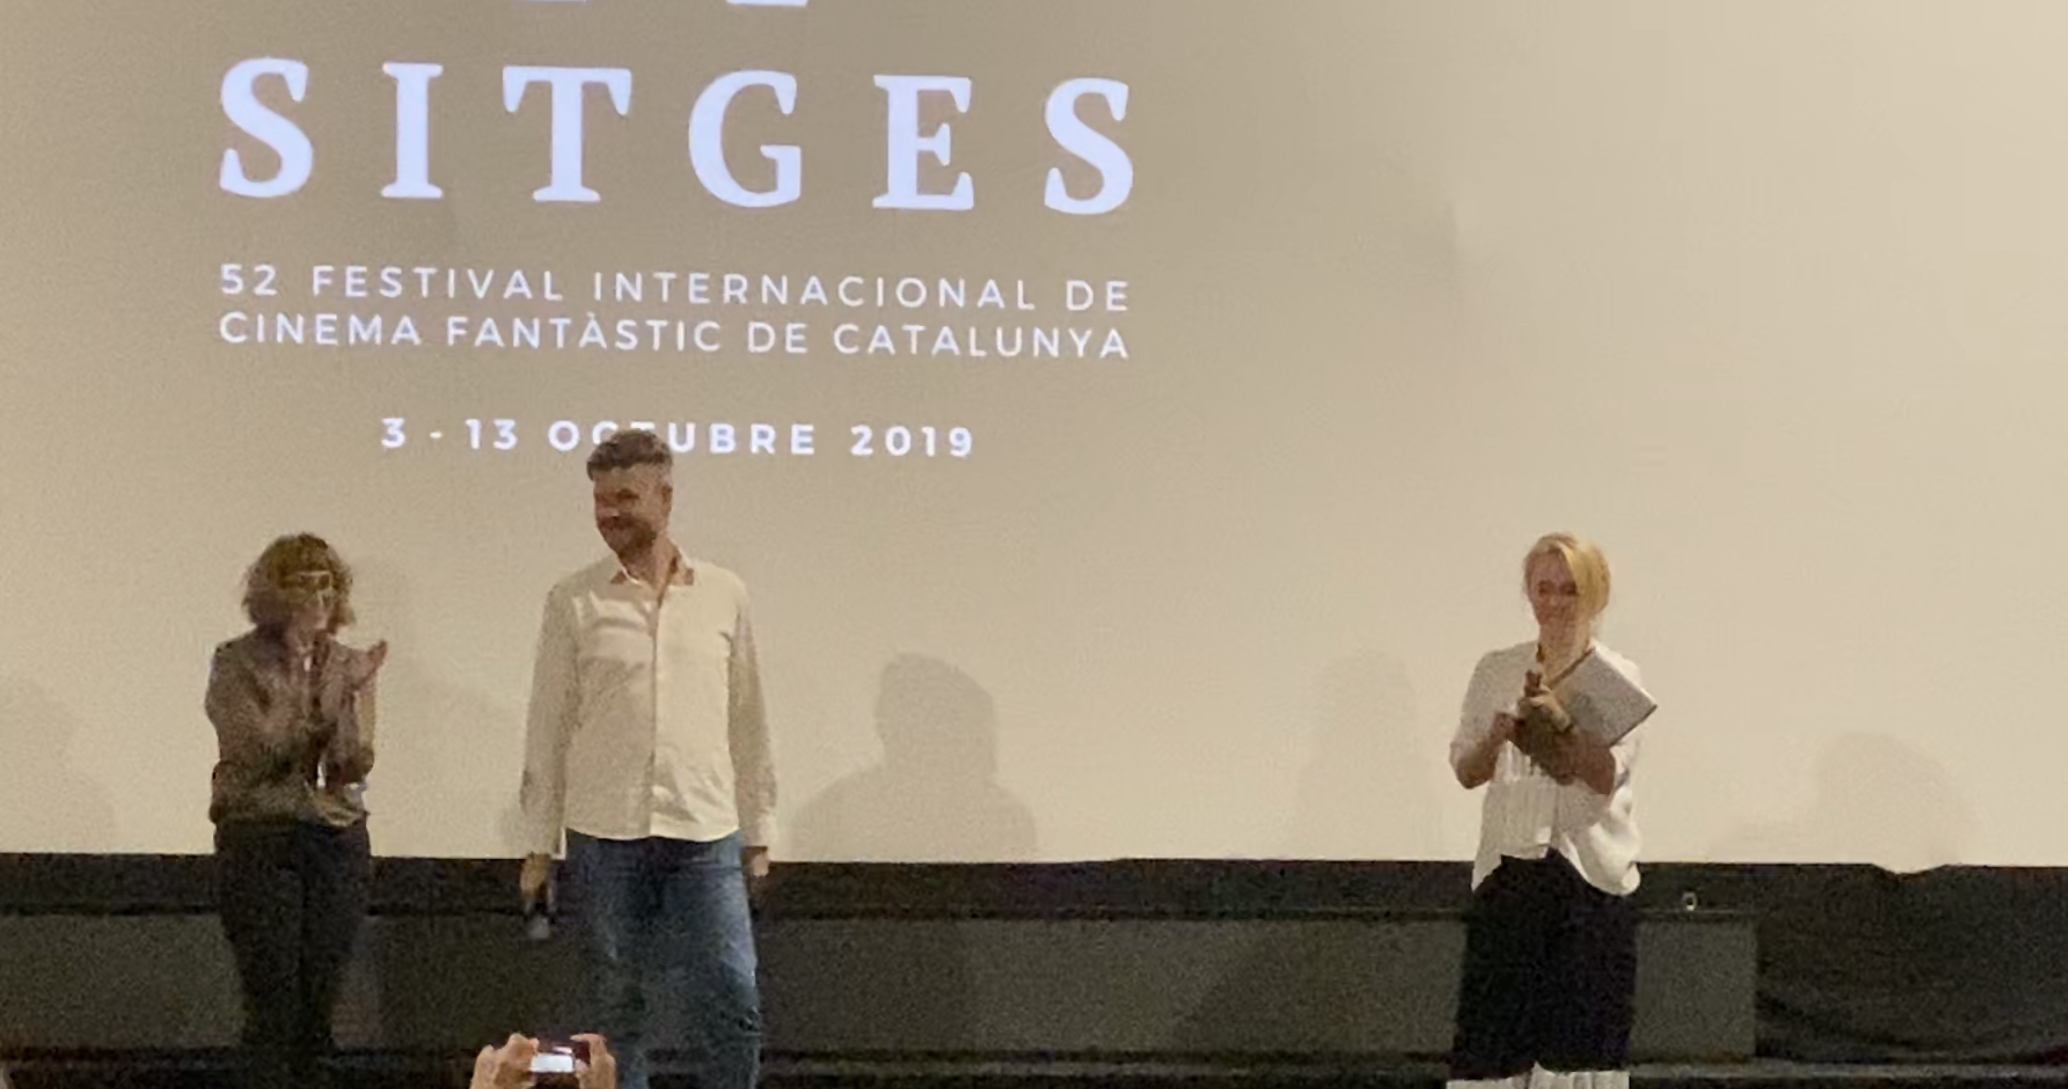 Presentación de Guns Akimbo en Sitges Film Festival 2019